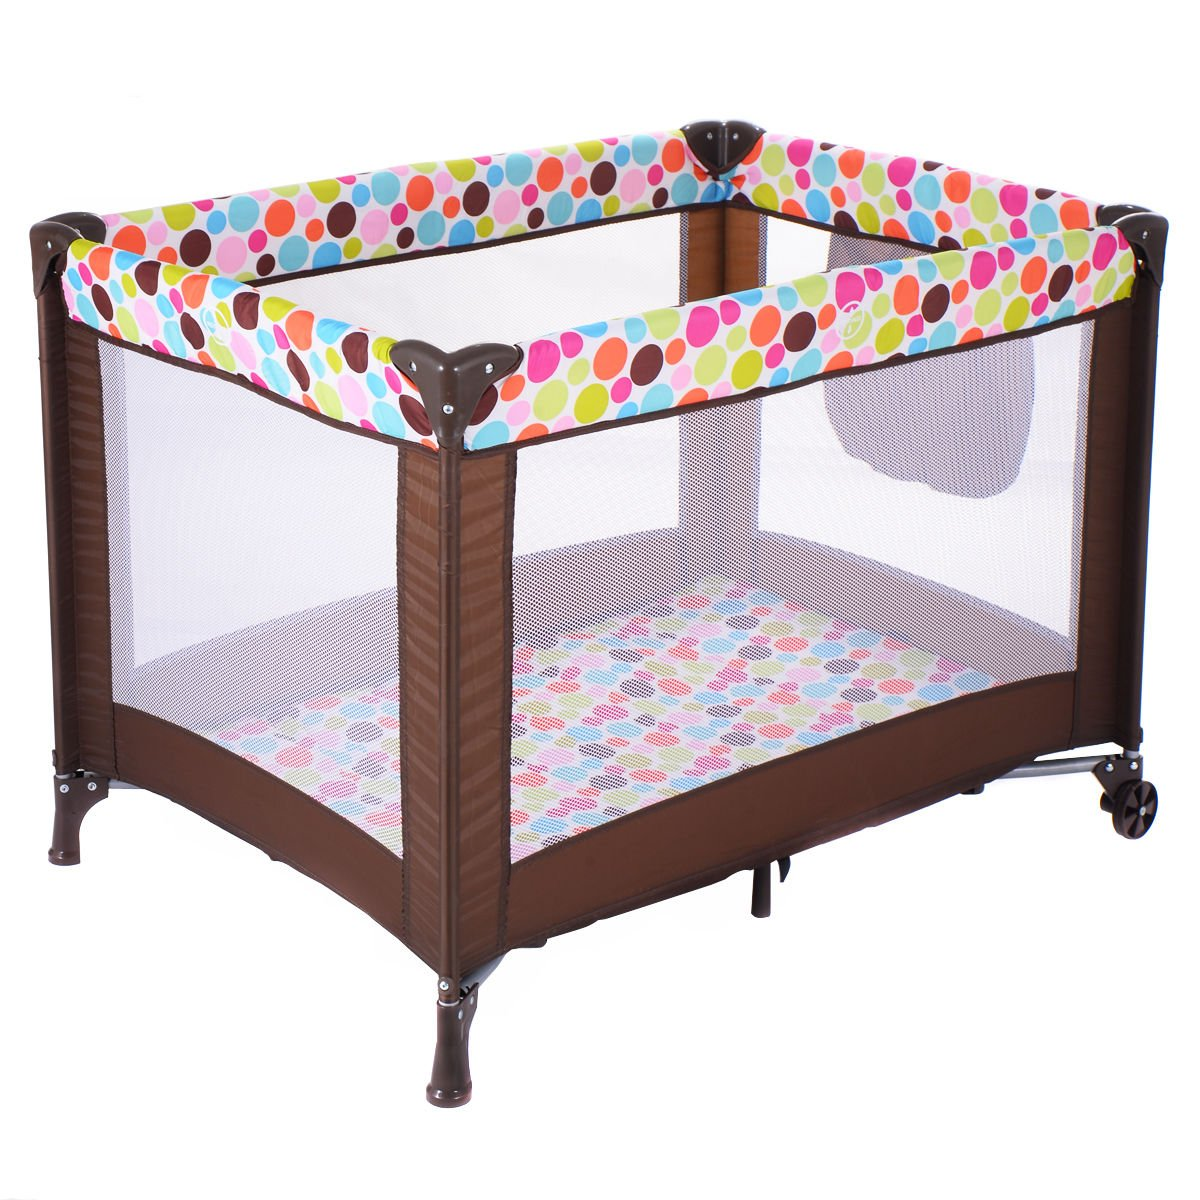 Playard Baby Bassinet Travel Portable Bed Playpen Toddler Foldable